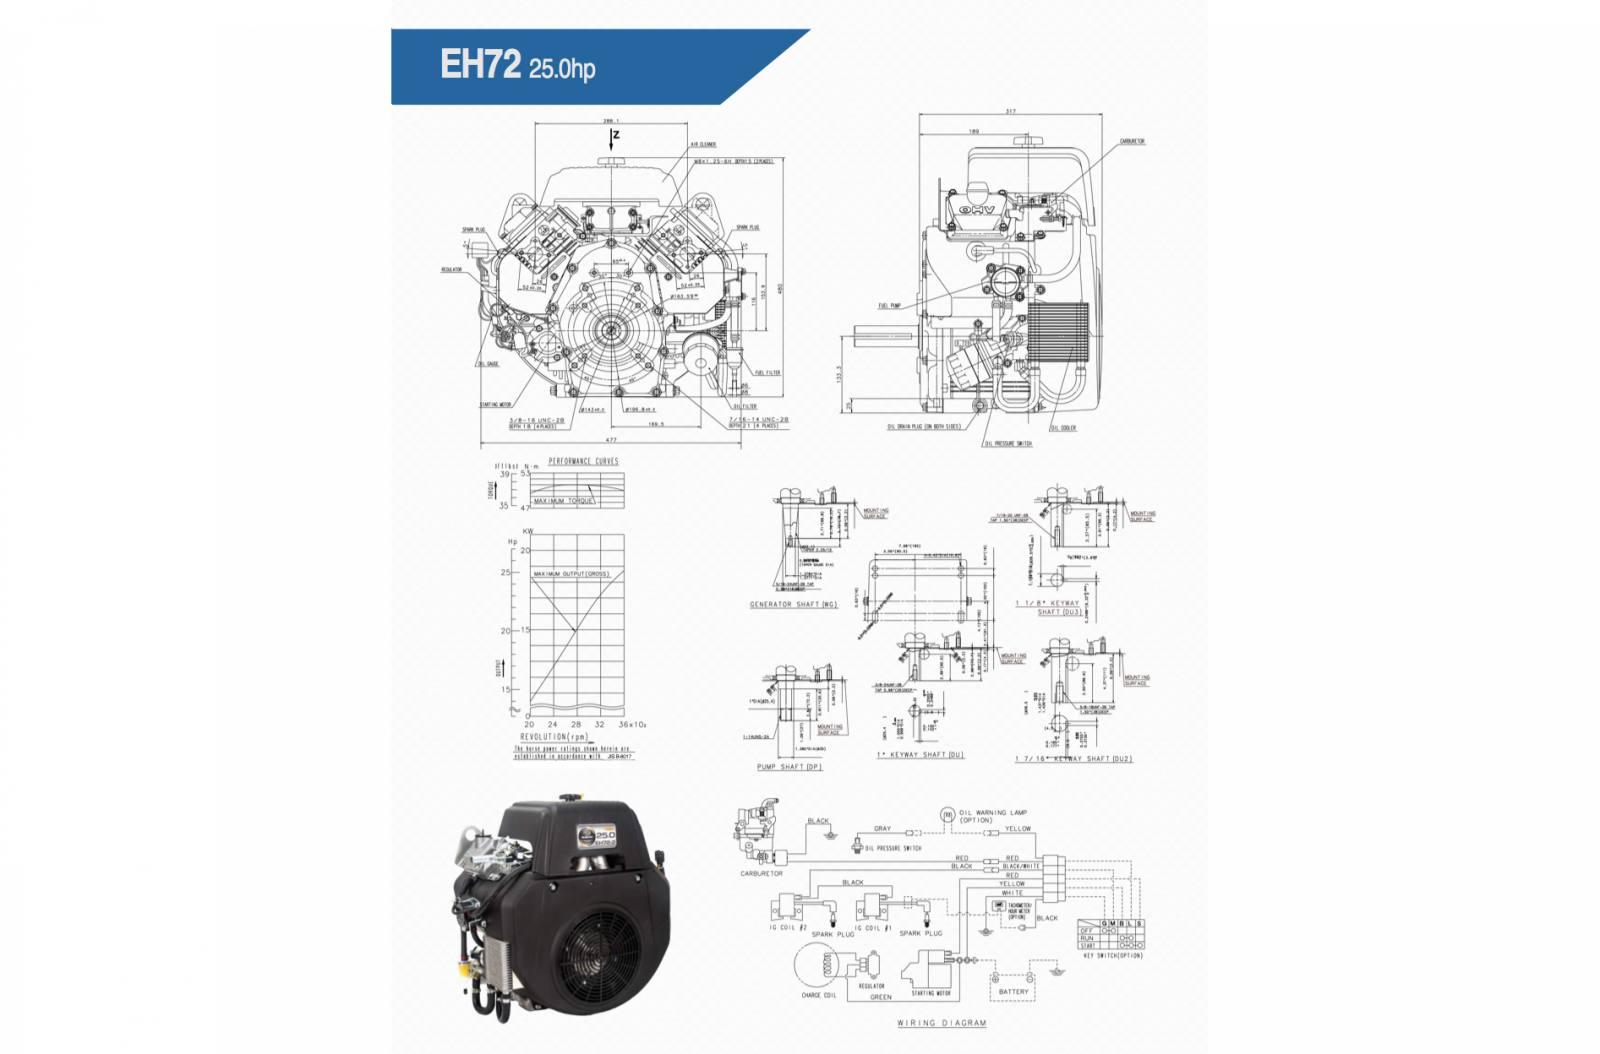 Robin Subaru Eh72 For Sale In Charlton Ny